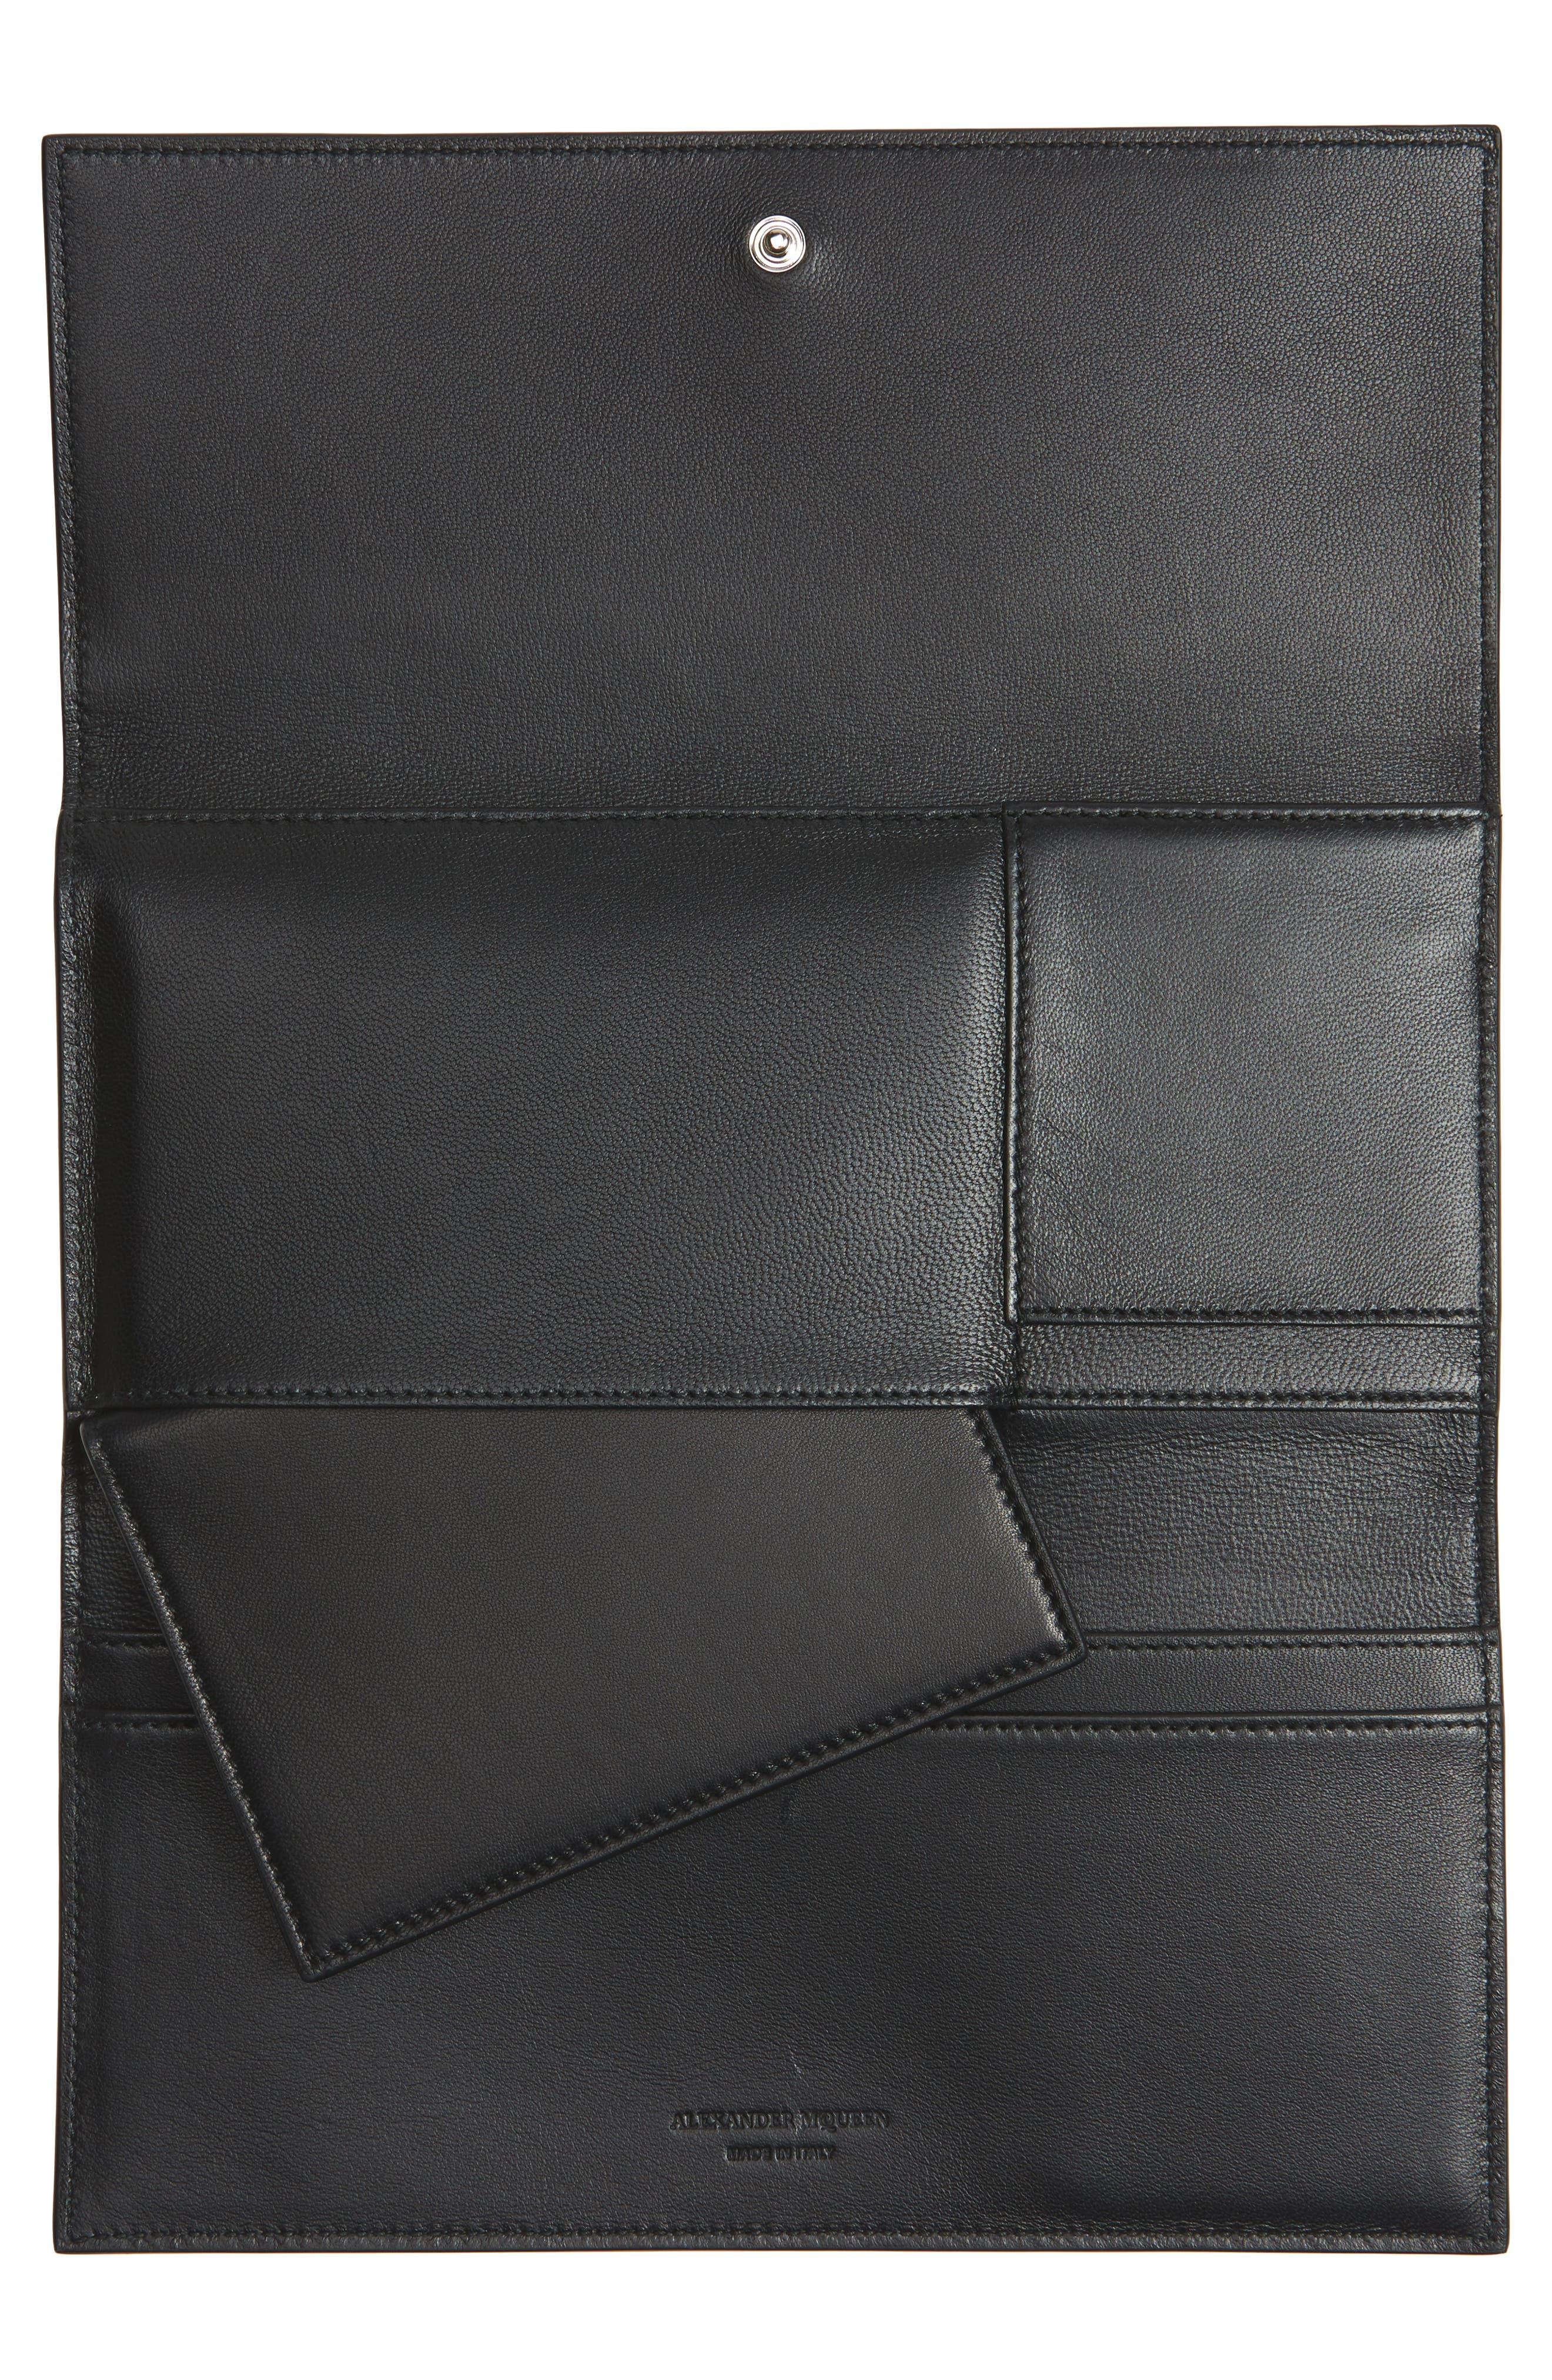 Studded Leather Travel Wallet,                             Alternate thumbnail 2, color,                             Black